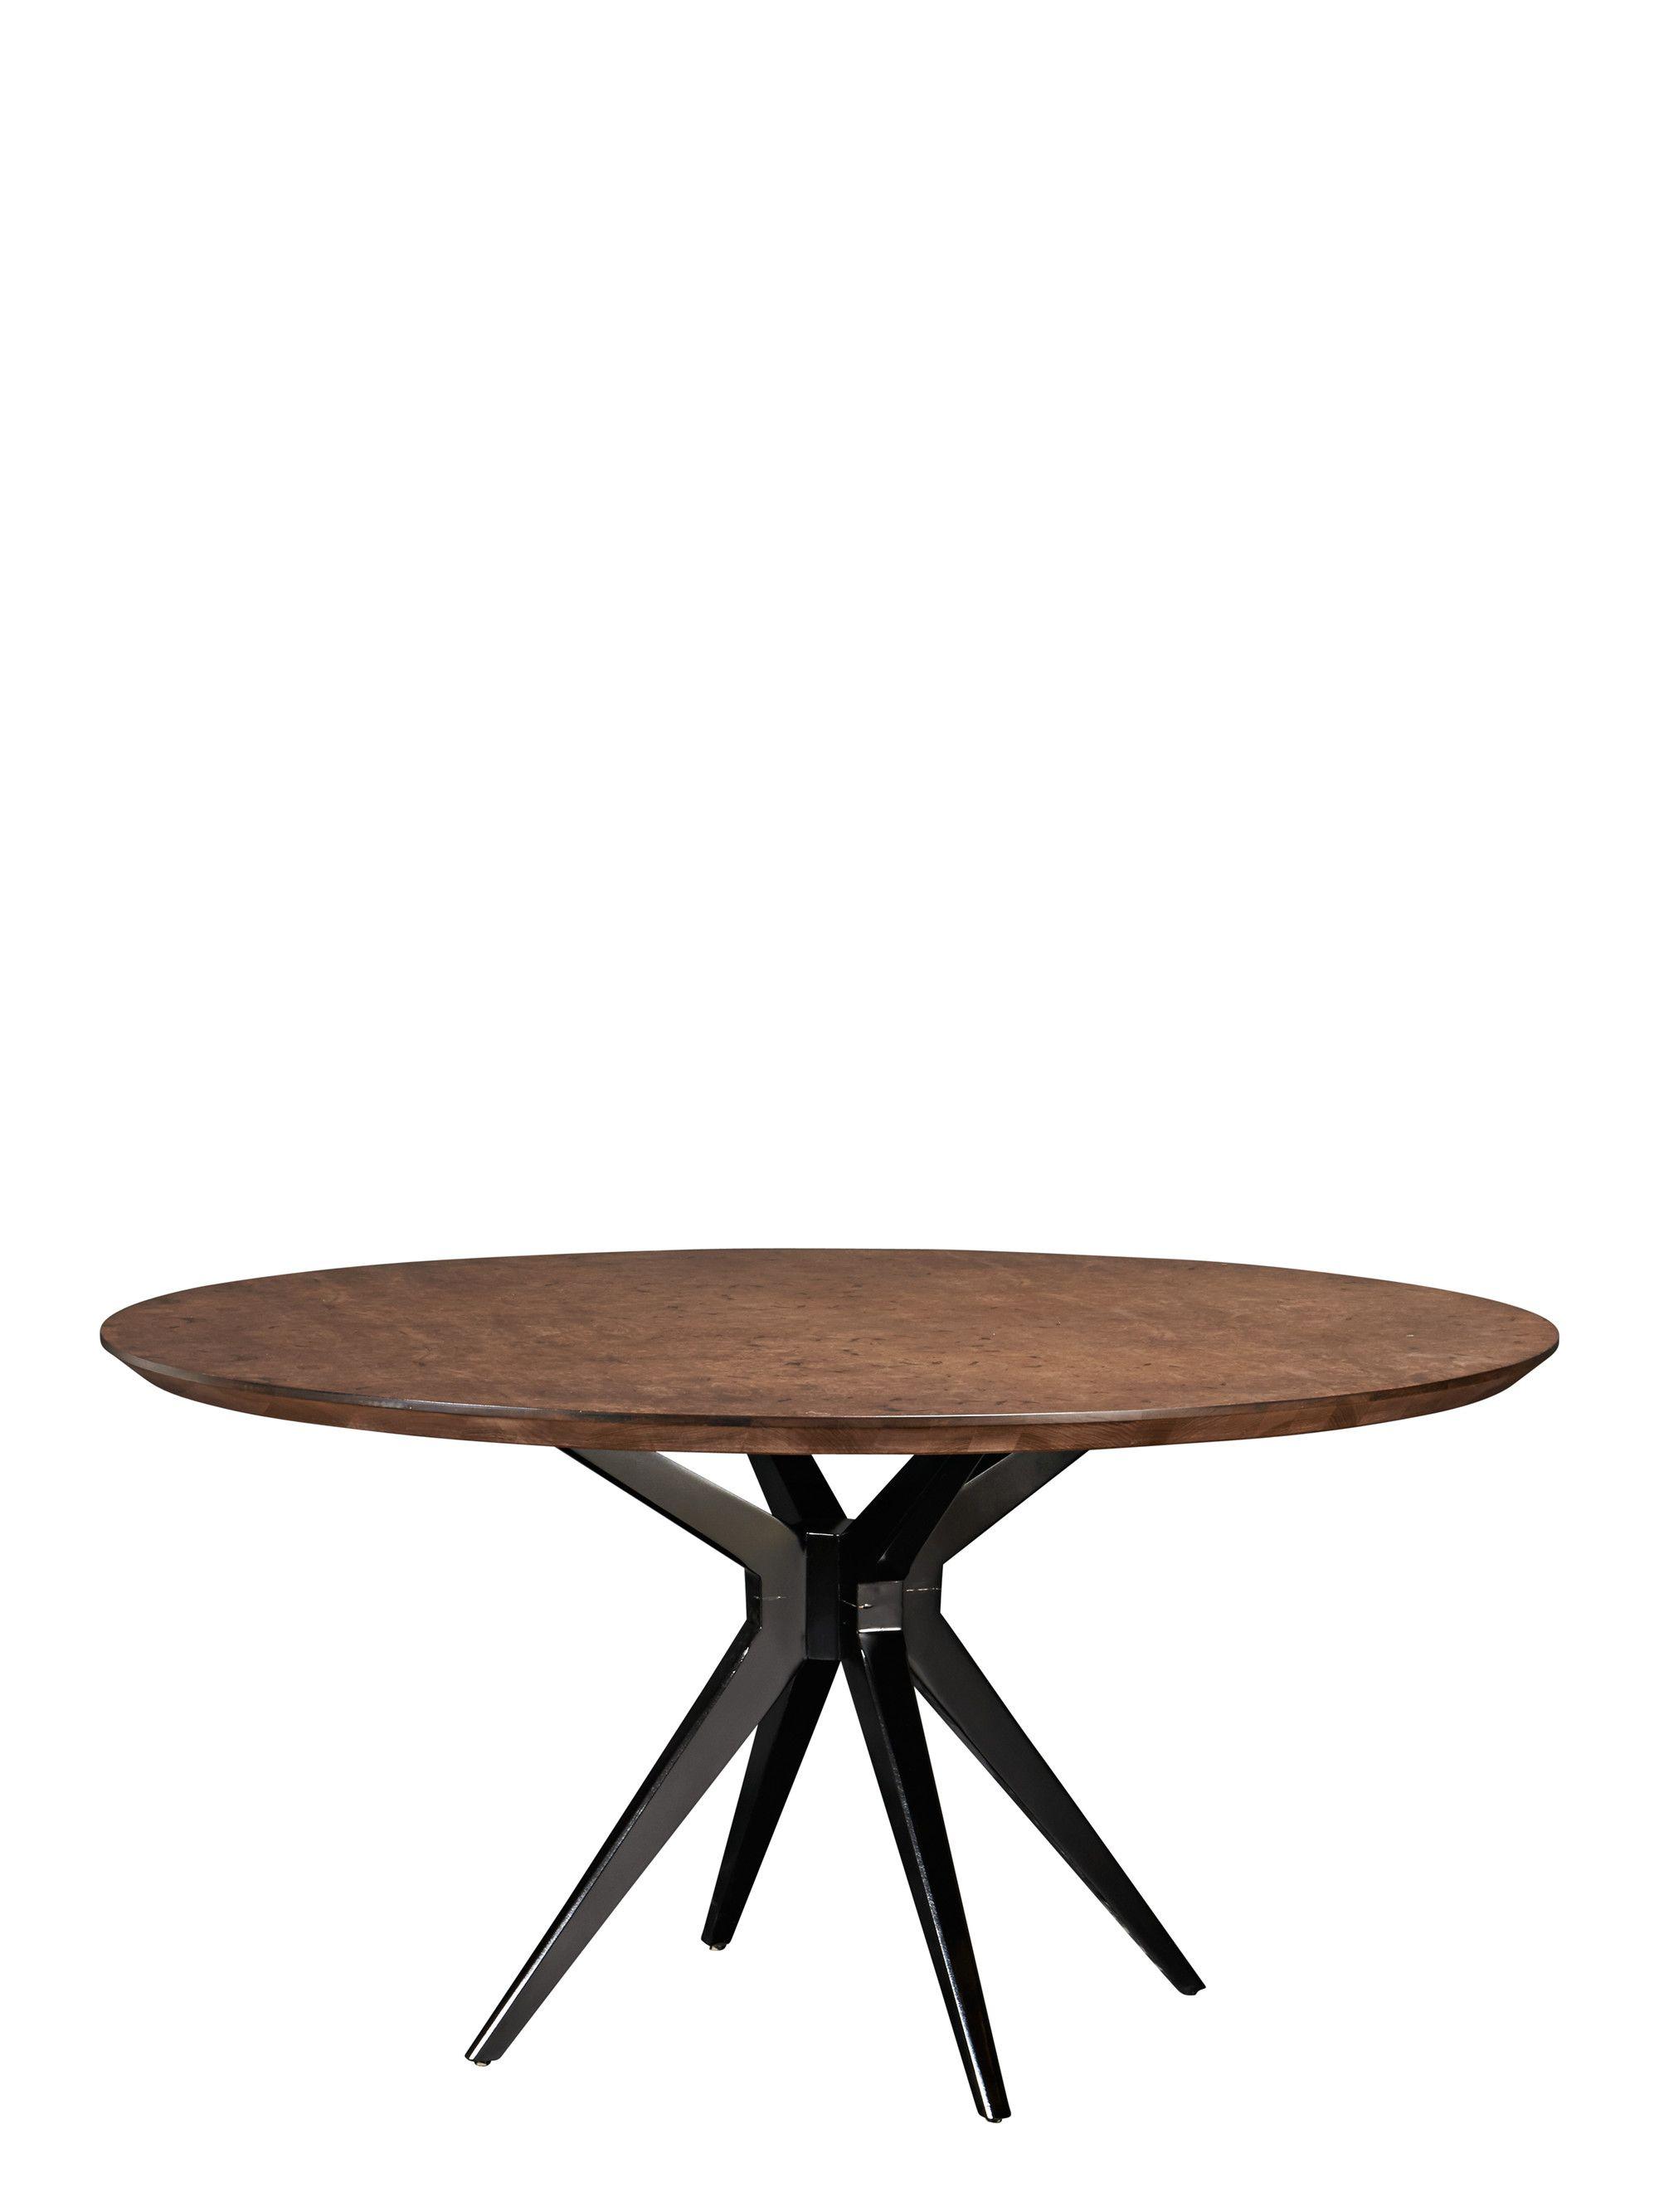 Our Best Dining Room Bar Furniture Deals Counter Height Dining Table Counter Height Dining Table Set Counter Height Table Sets